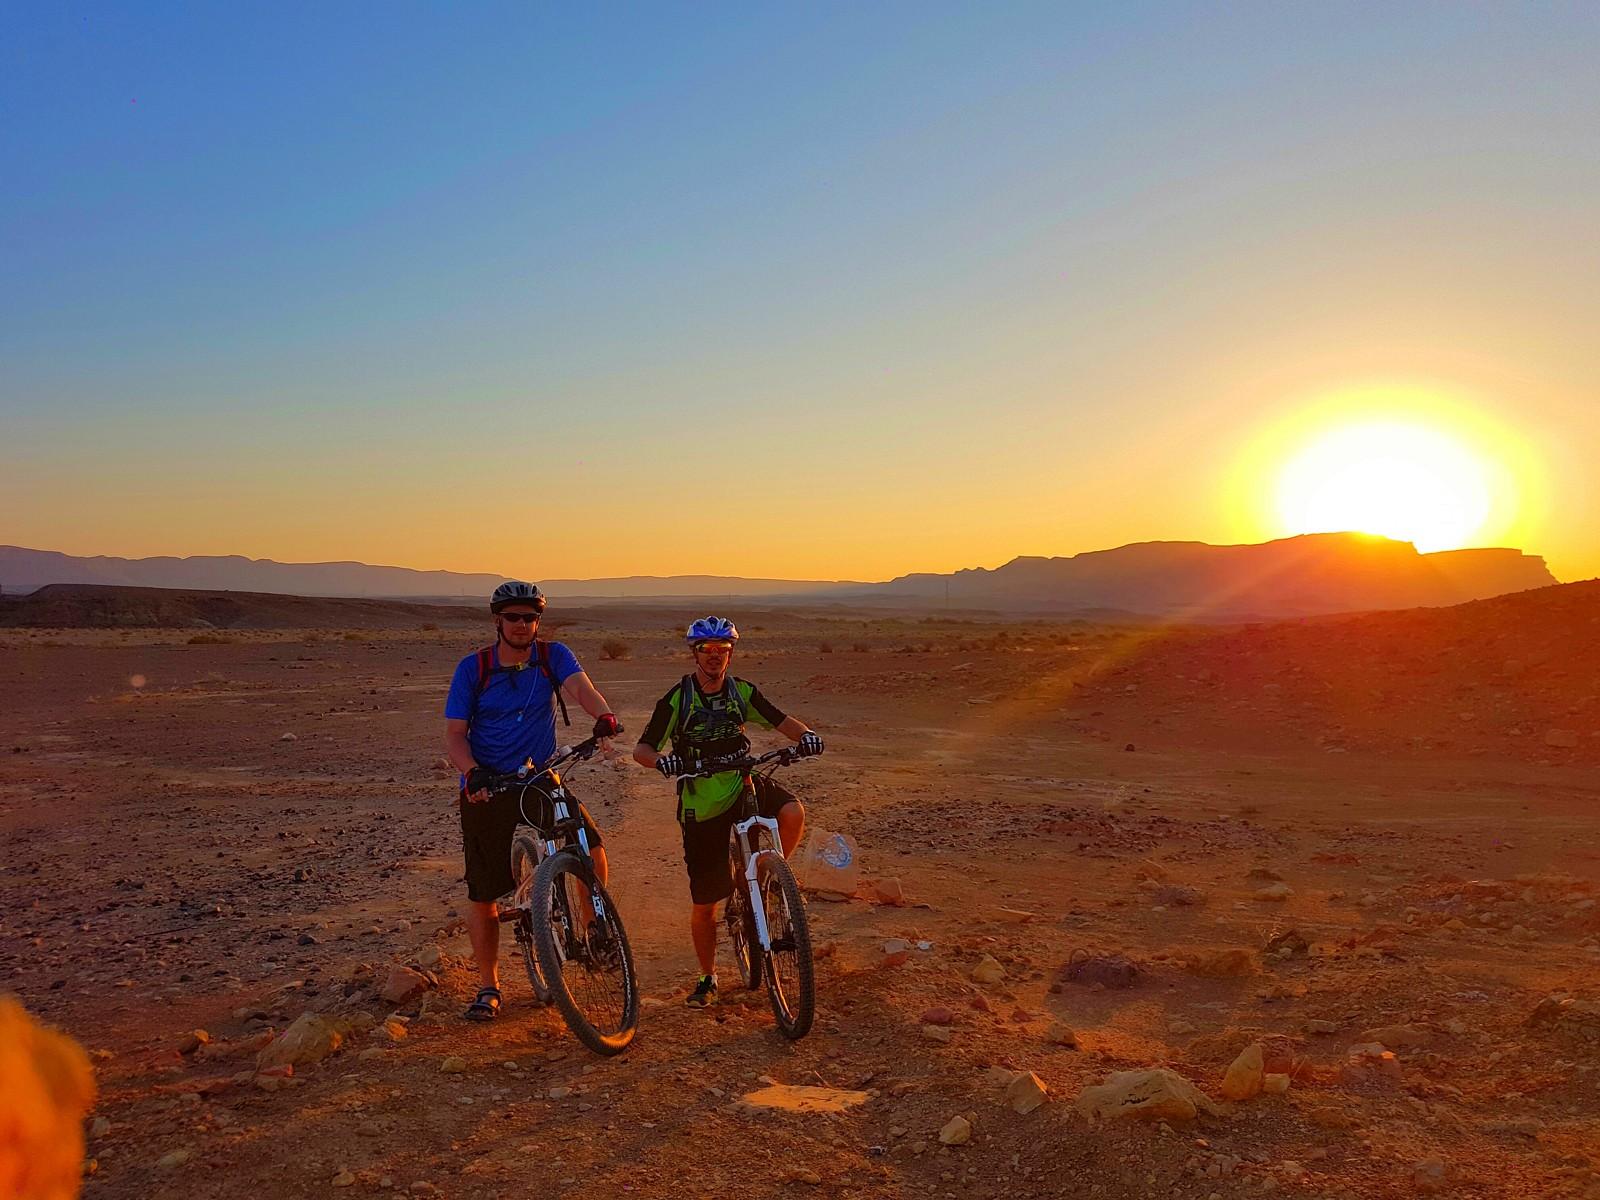 CYMERA 20190701 082952 - guy191184 - Mountain Biking Pictures - Vital MTB